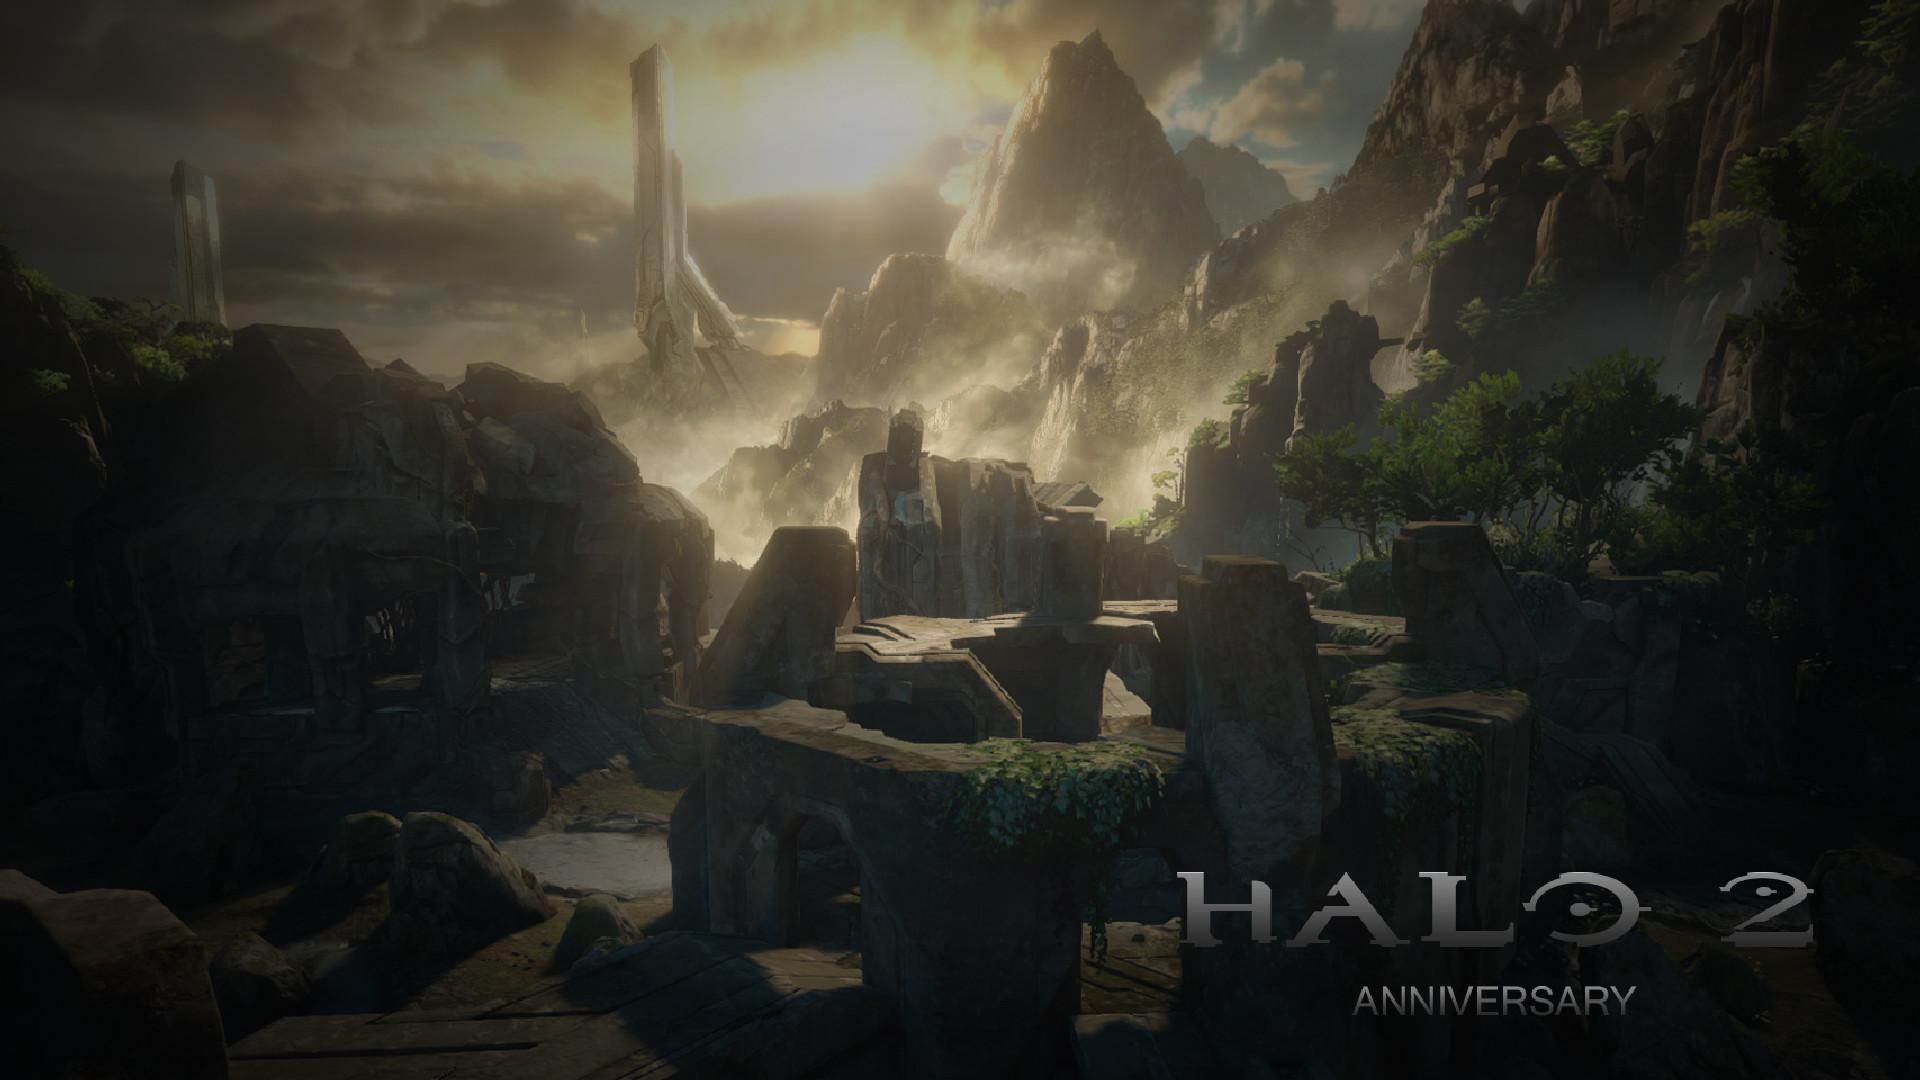 … Halo 2: Anniversary (Shrine map) Wallpaper Full HD by EliteSpartan1